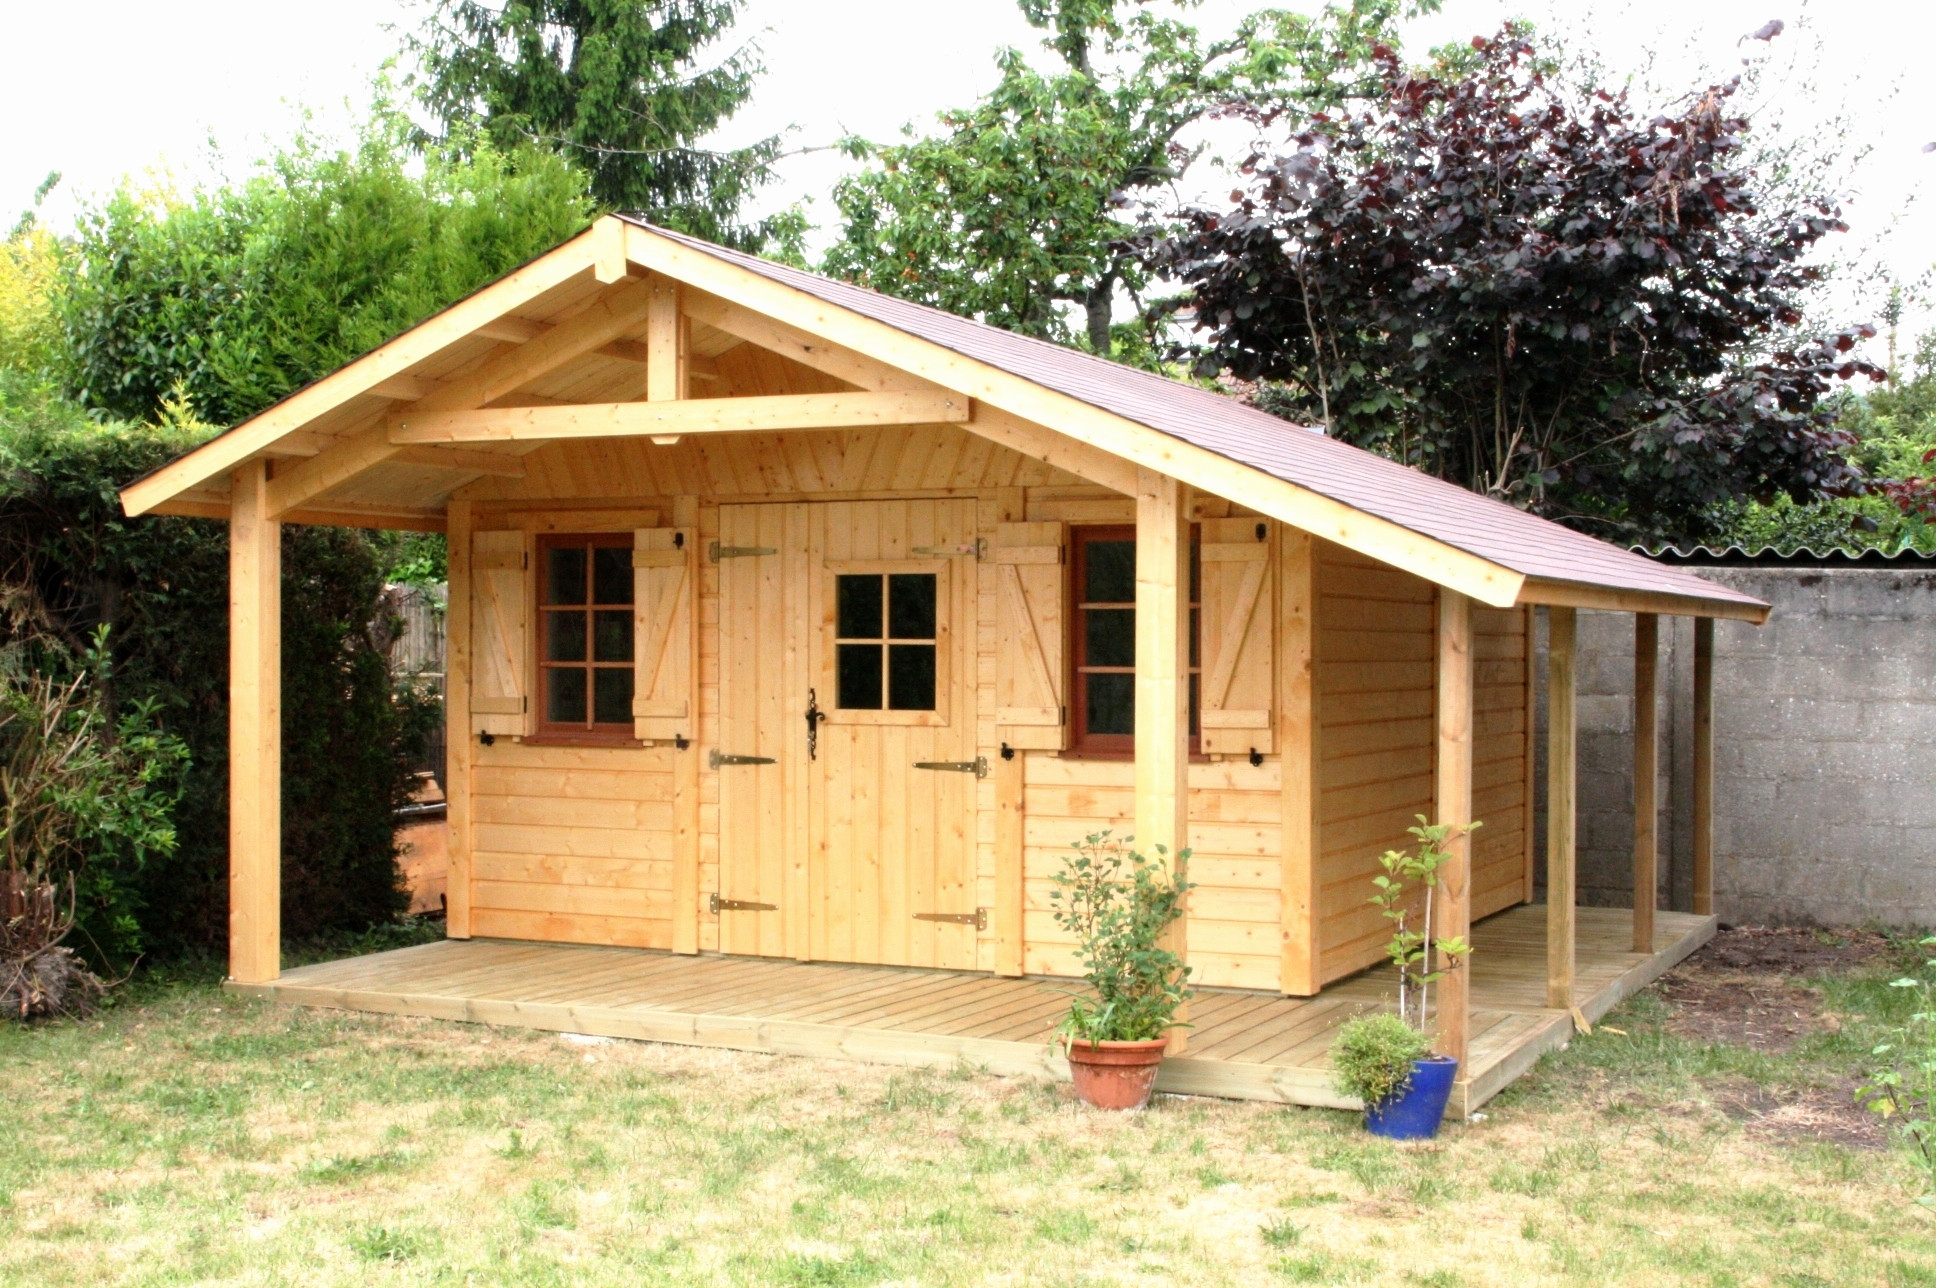 Abri De Jardin En Bois Carrefour Beau Photographie Destockage Abri De Jardin De Brillant Abri De Jardin Pvc Moderne